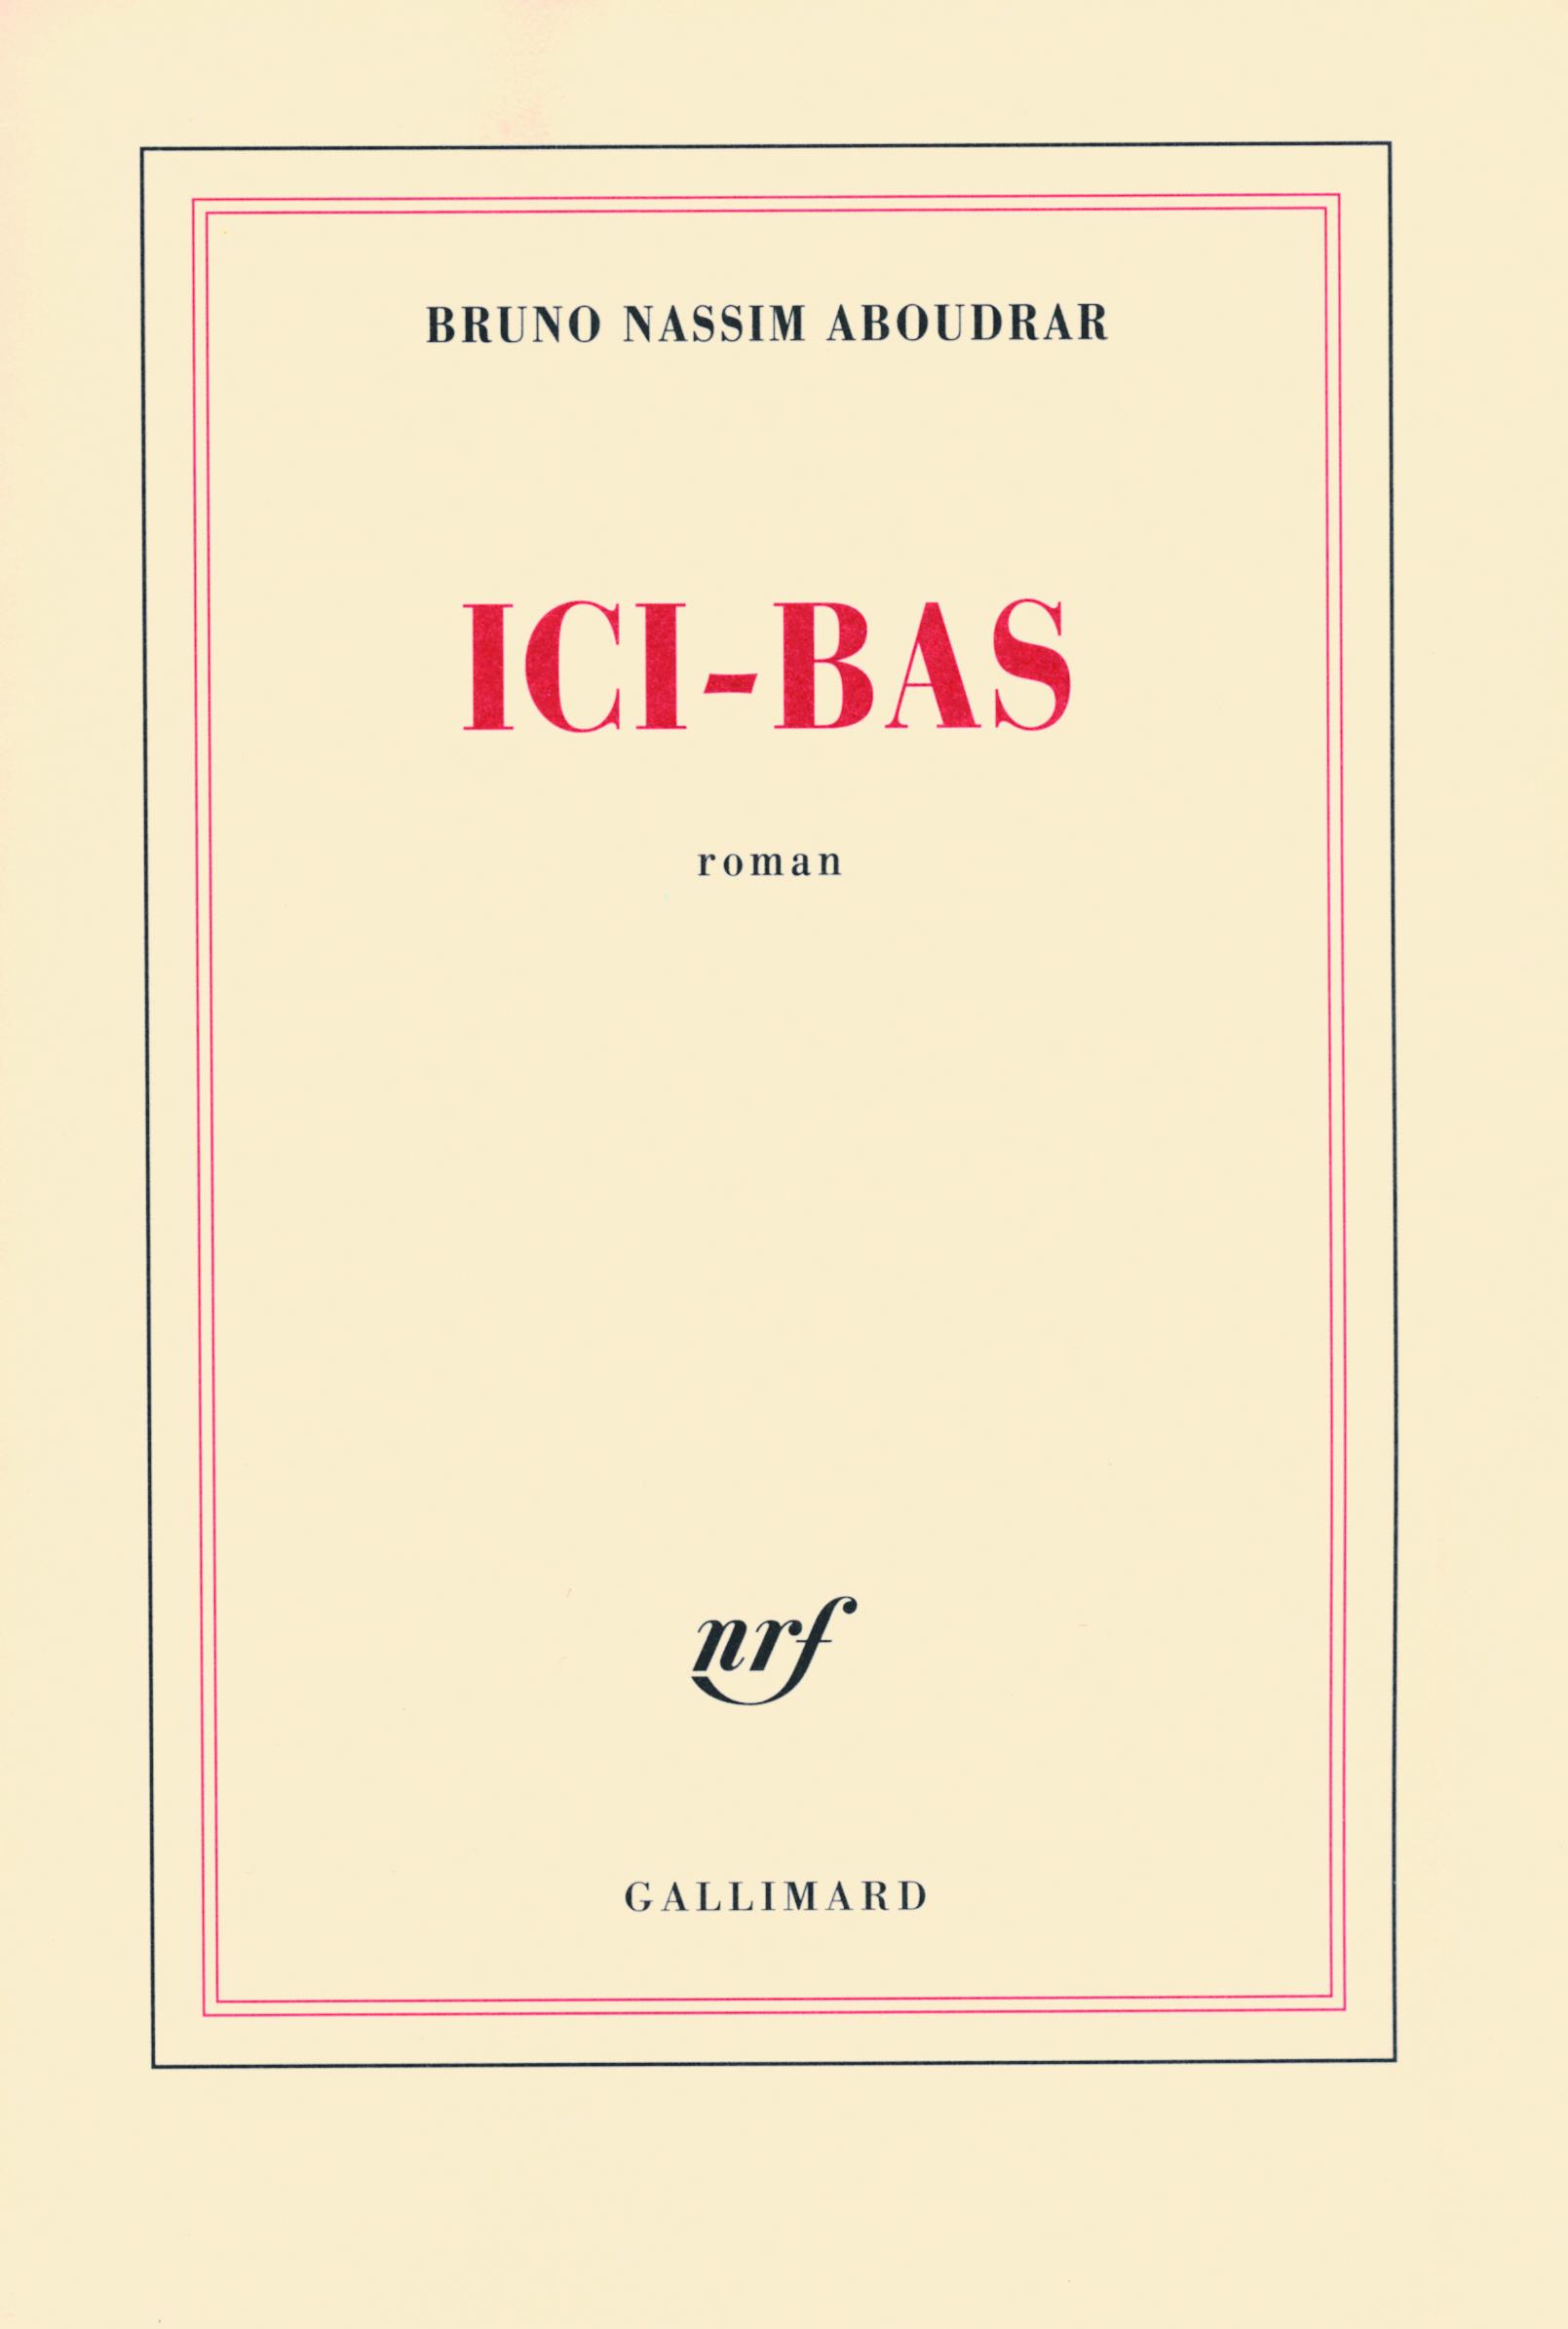 ICI-BAS ROMAN